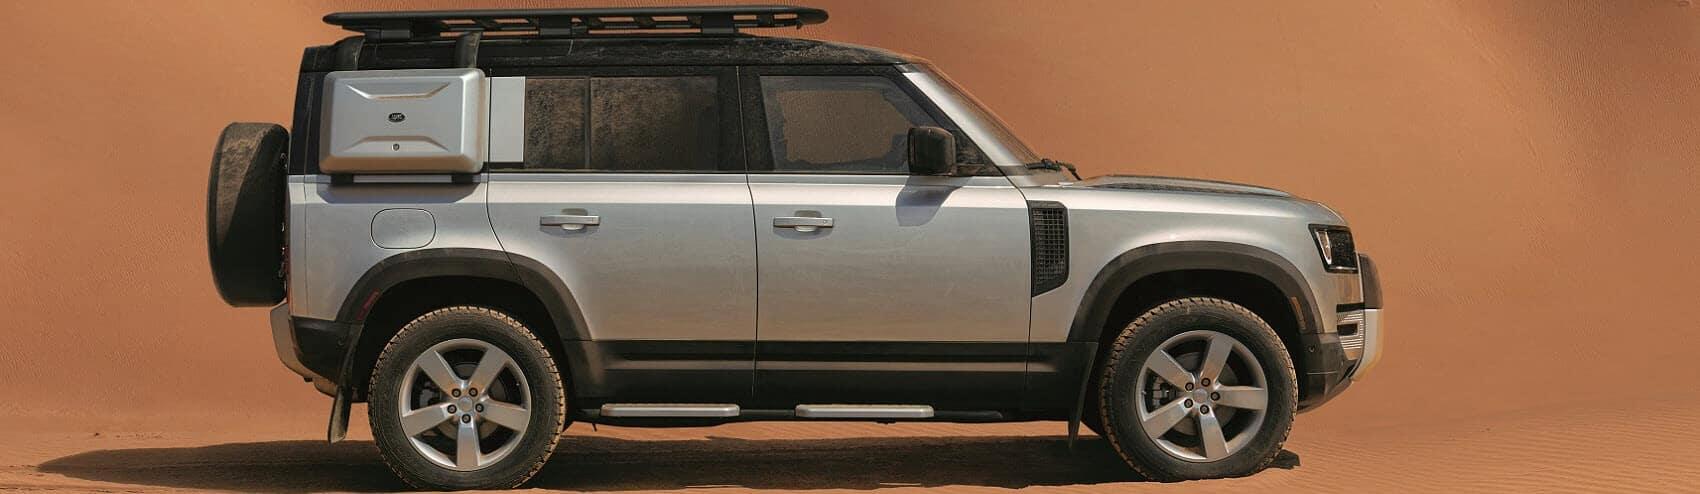 2020 Land Rover Defender Engine Specs